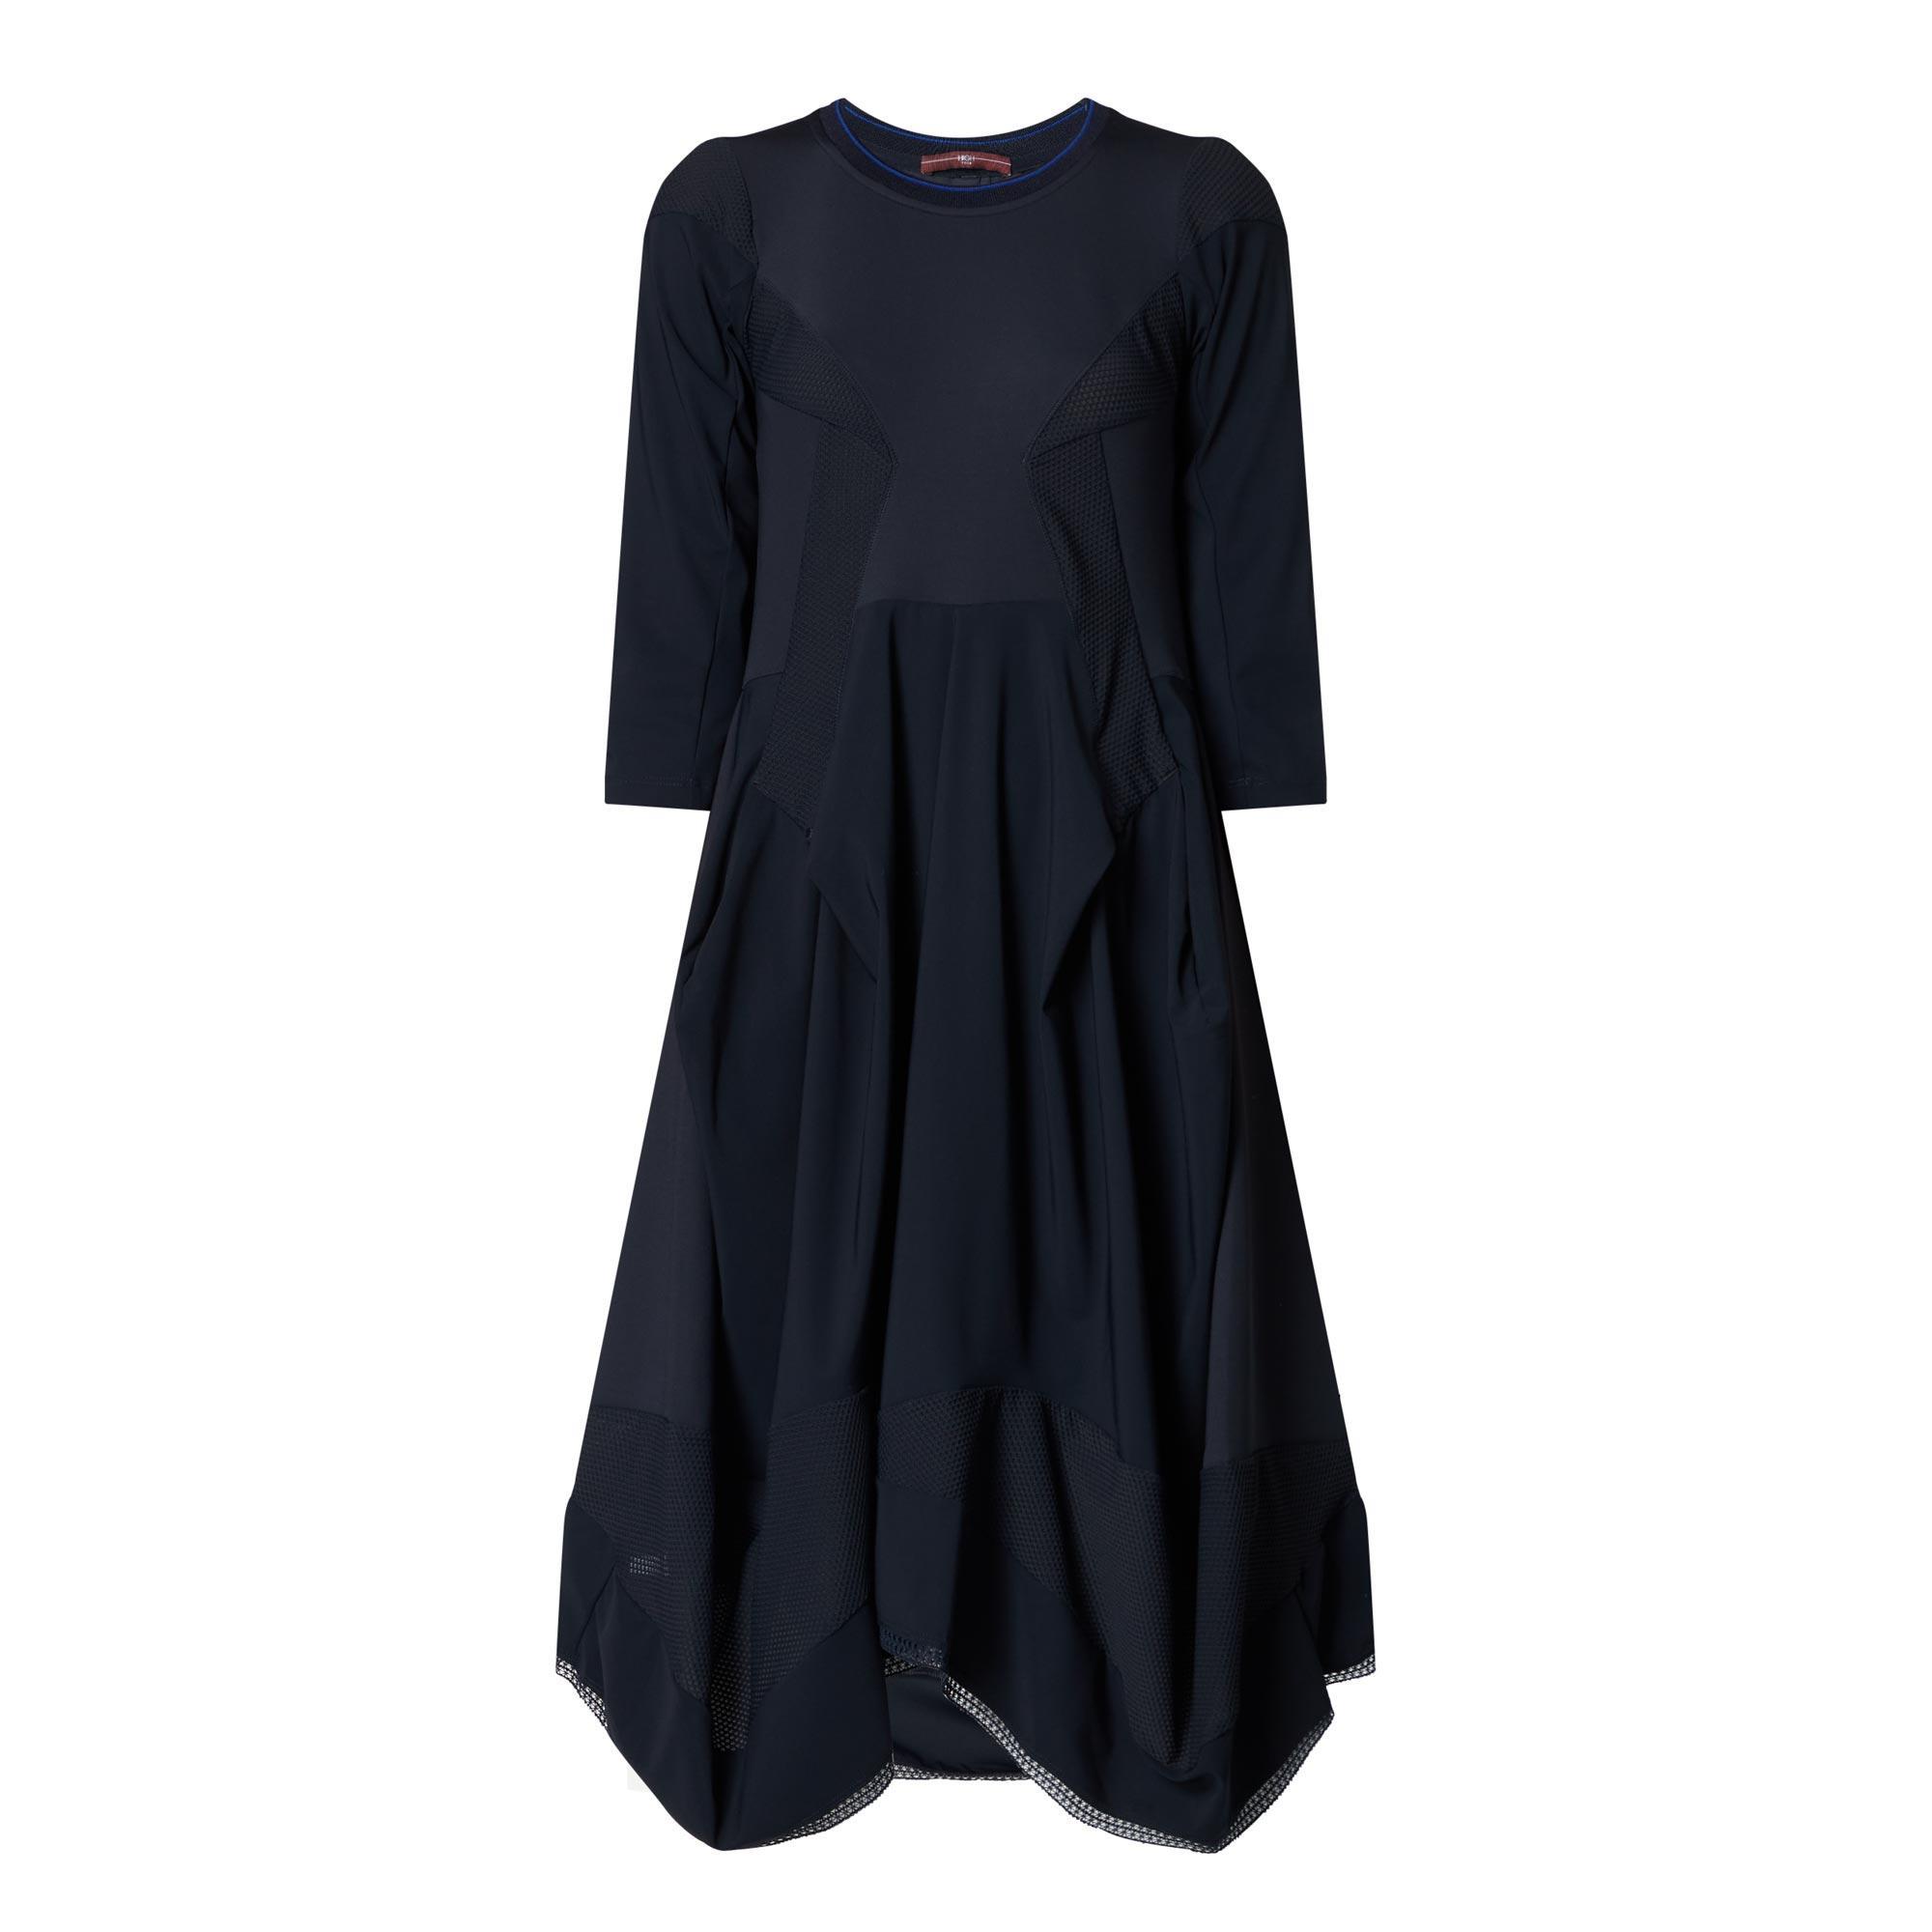 Praise Midi Dress